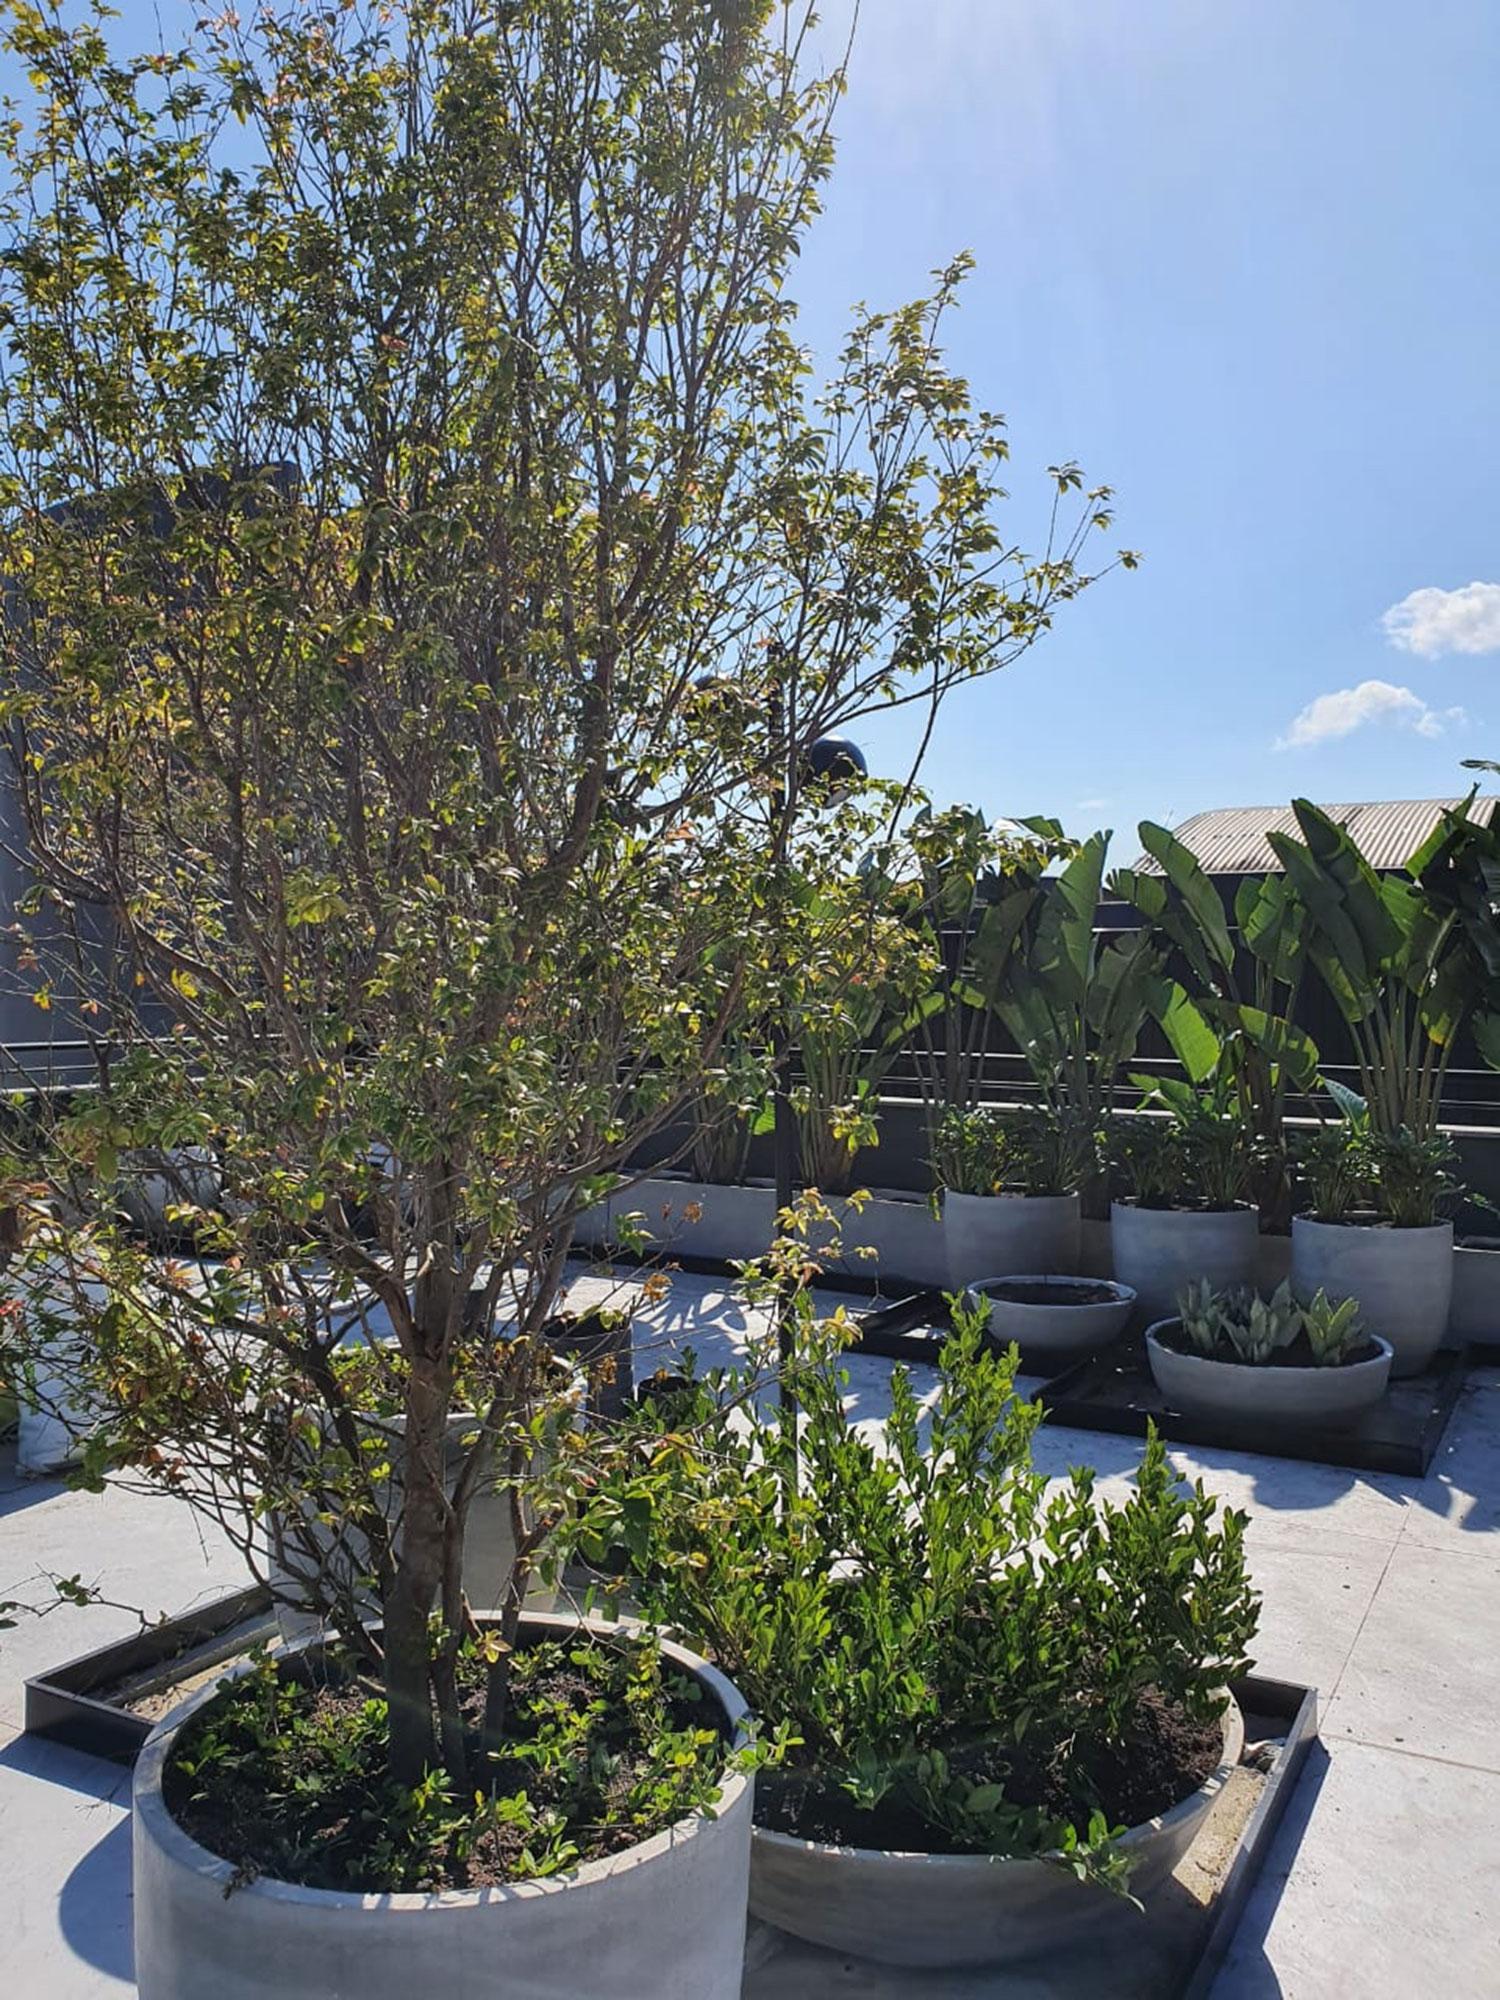 Ana-Trevisan-Rooftop-casacor-santa-catarina-florianopolis-2021